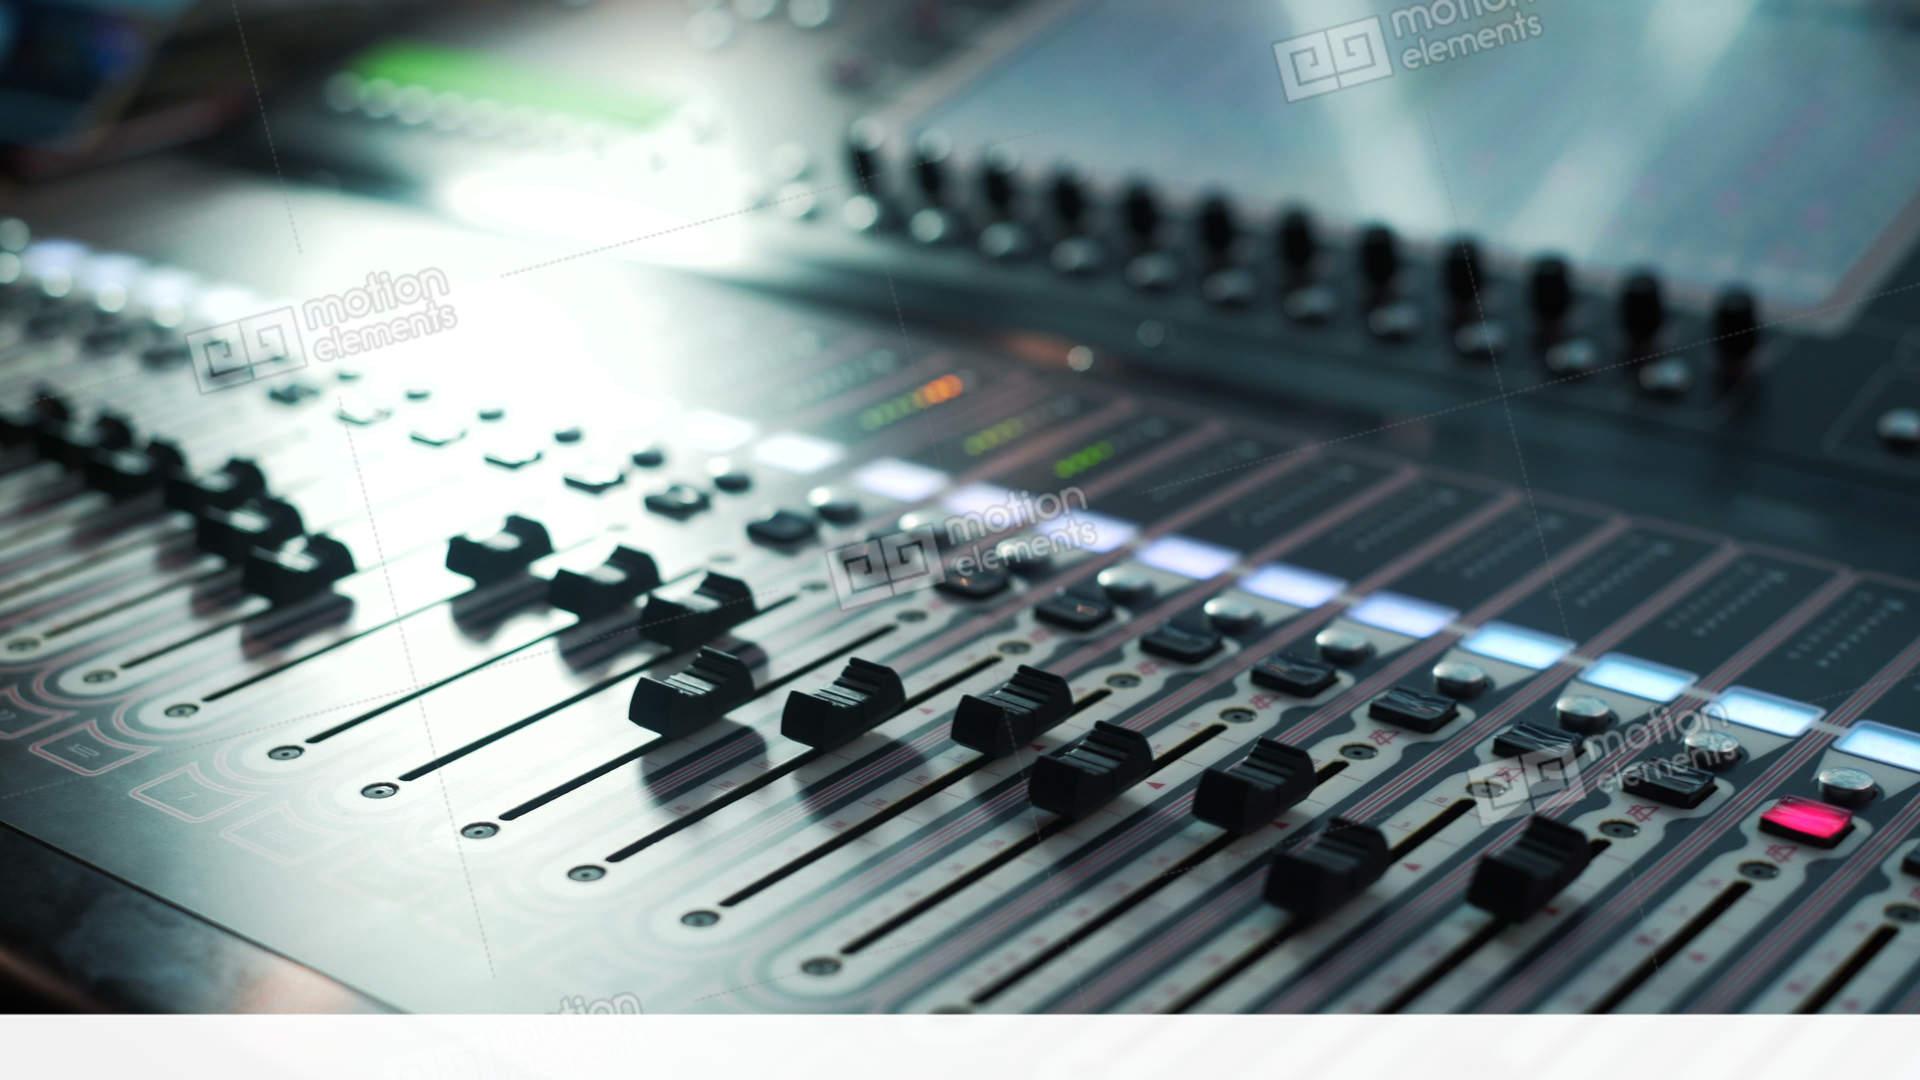 me11181571-music-studio-audio-mixer-digital-sound-mixer-studio-close-up-russia-4k-a0065.jpg